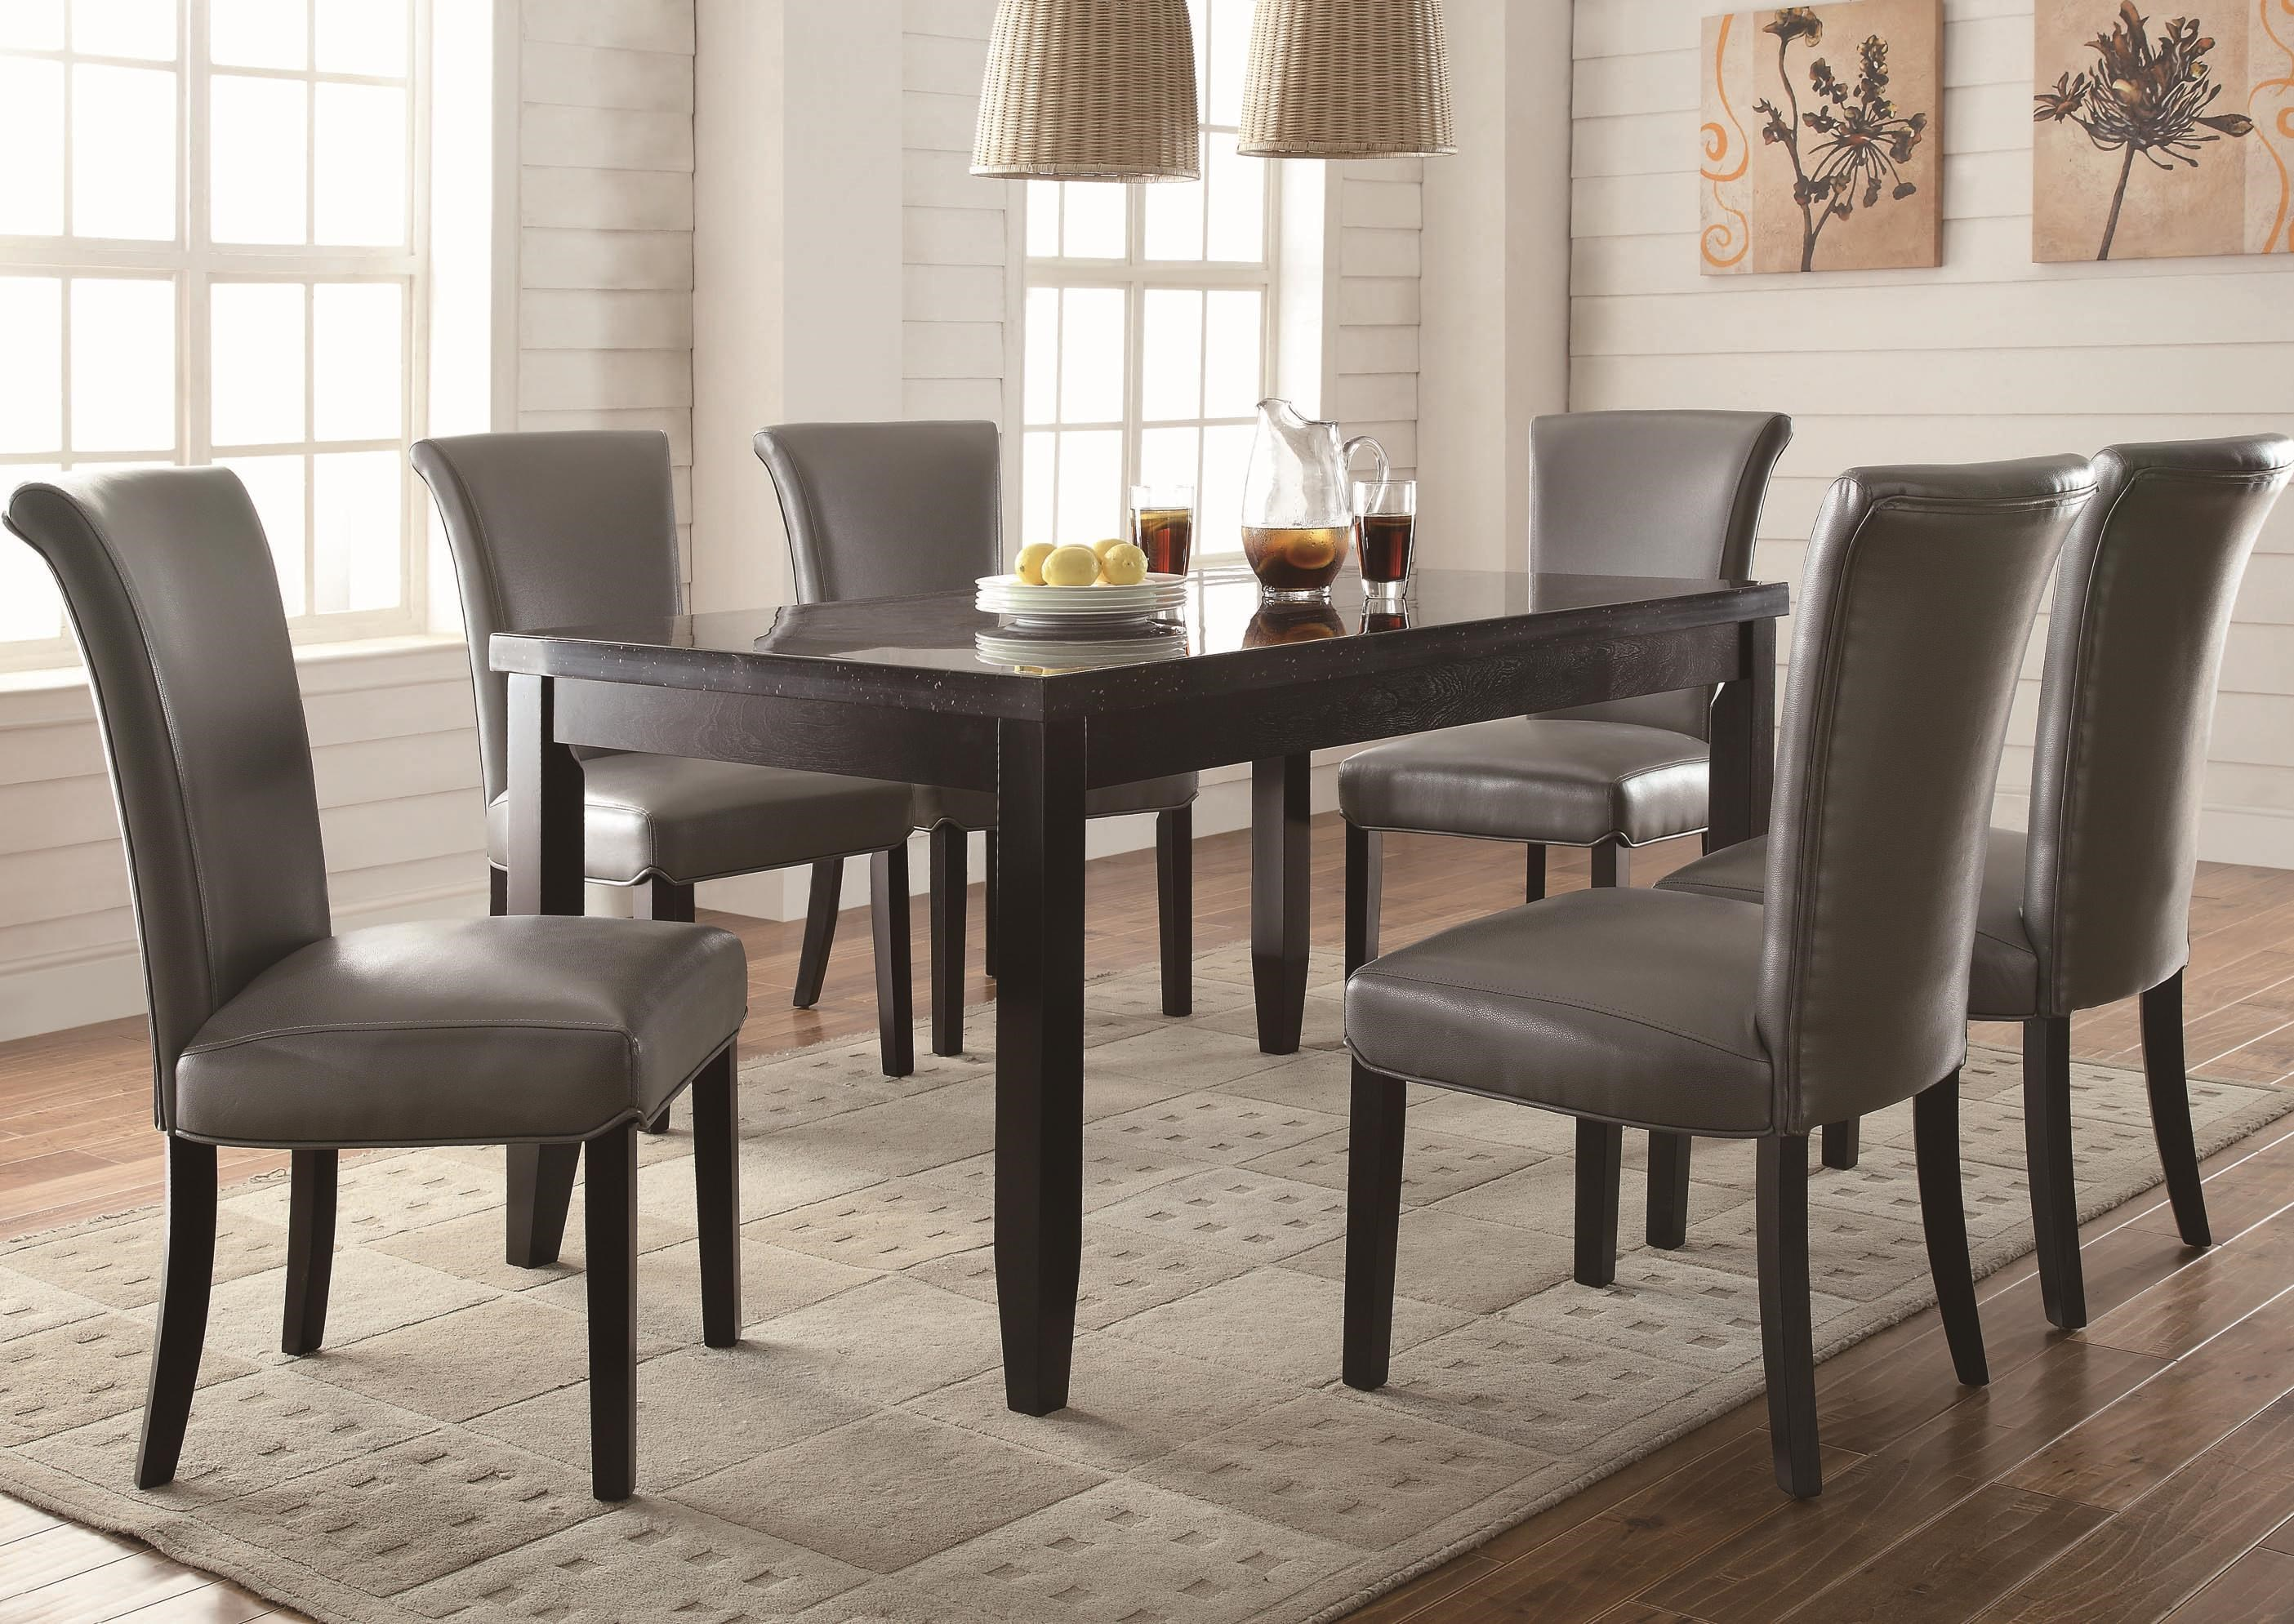 coaster newbridge 7 piece dining table chair set value city rh valuecitynj com  coaster retro round dining kitchen table in chrome / white